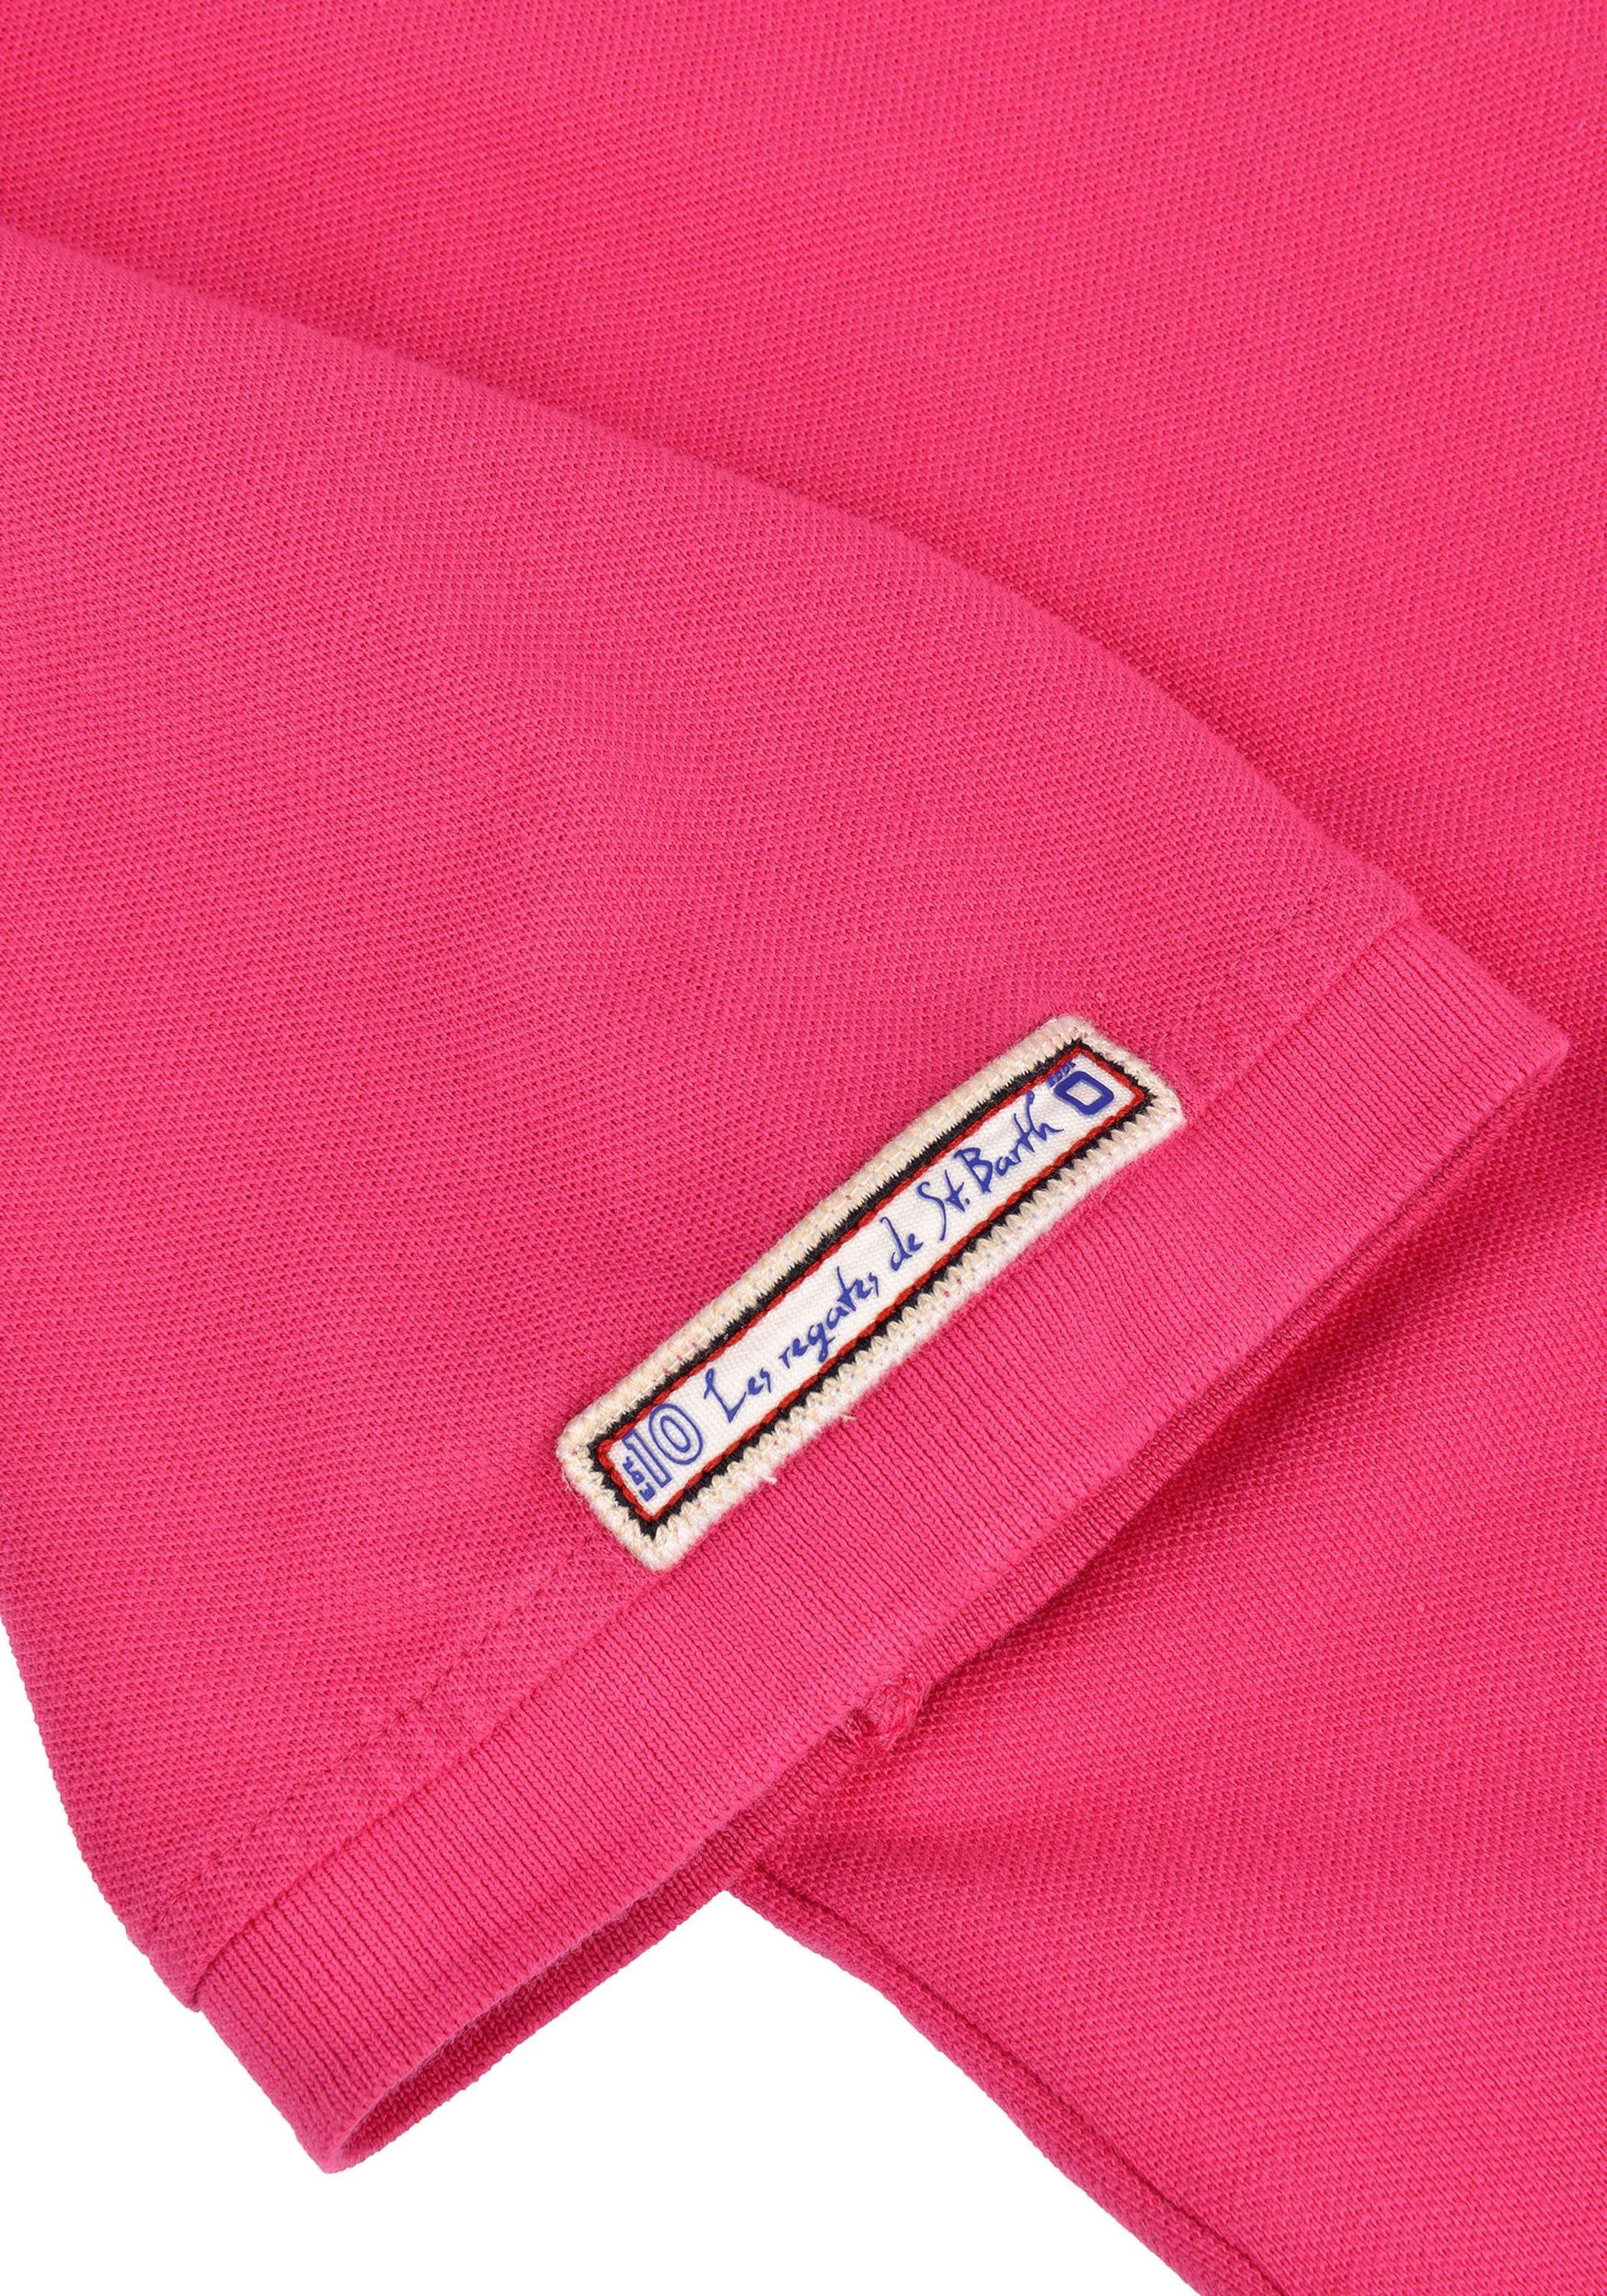 Code zero Polo Regatta' Pink Caribbean In 'ss kOPnw80